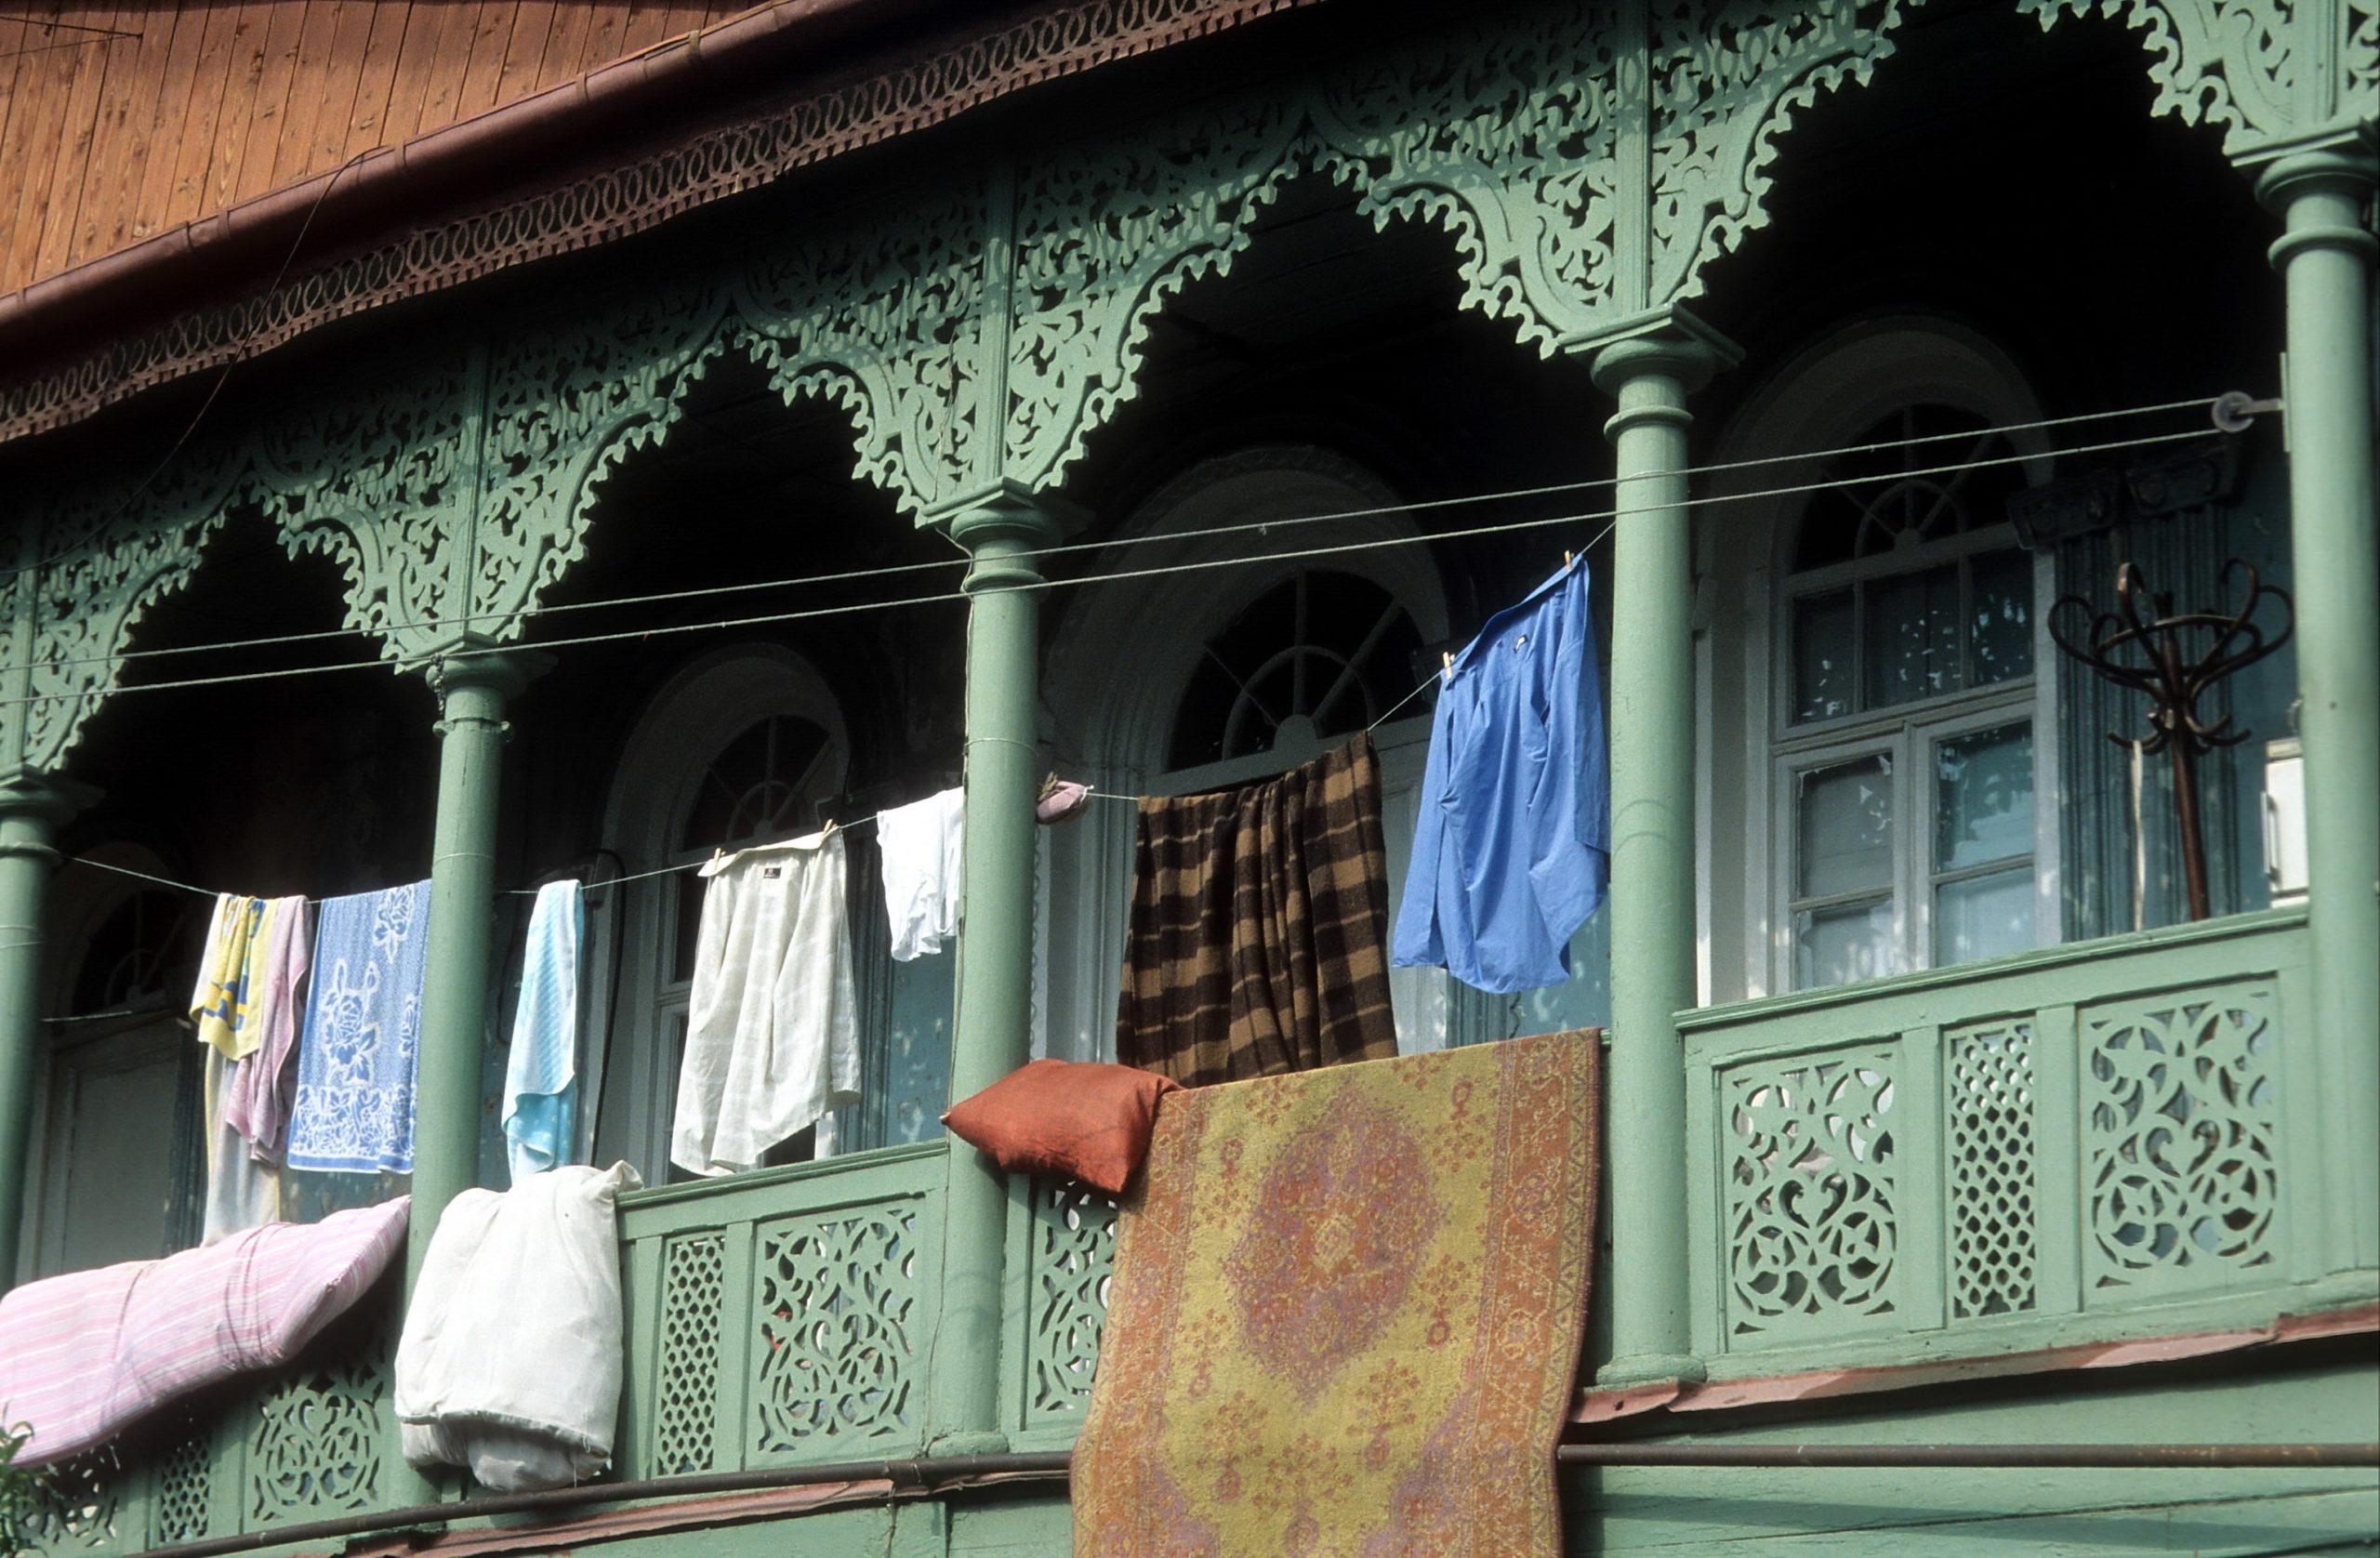 via verde reisen - Georgien - Balkon in Tbilisi